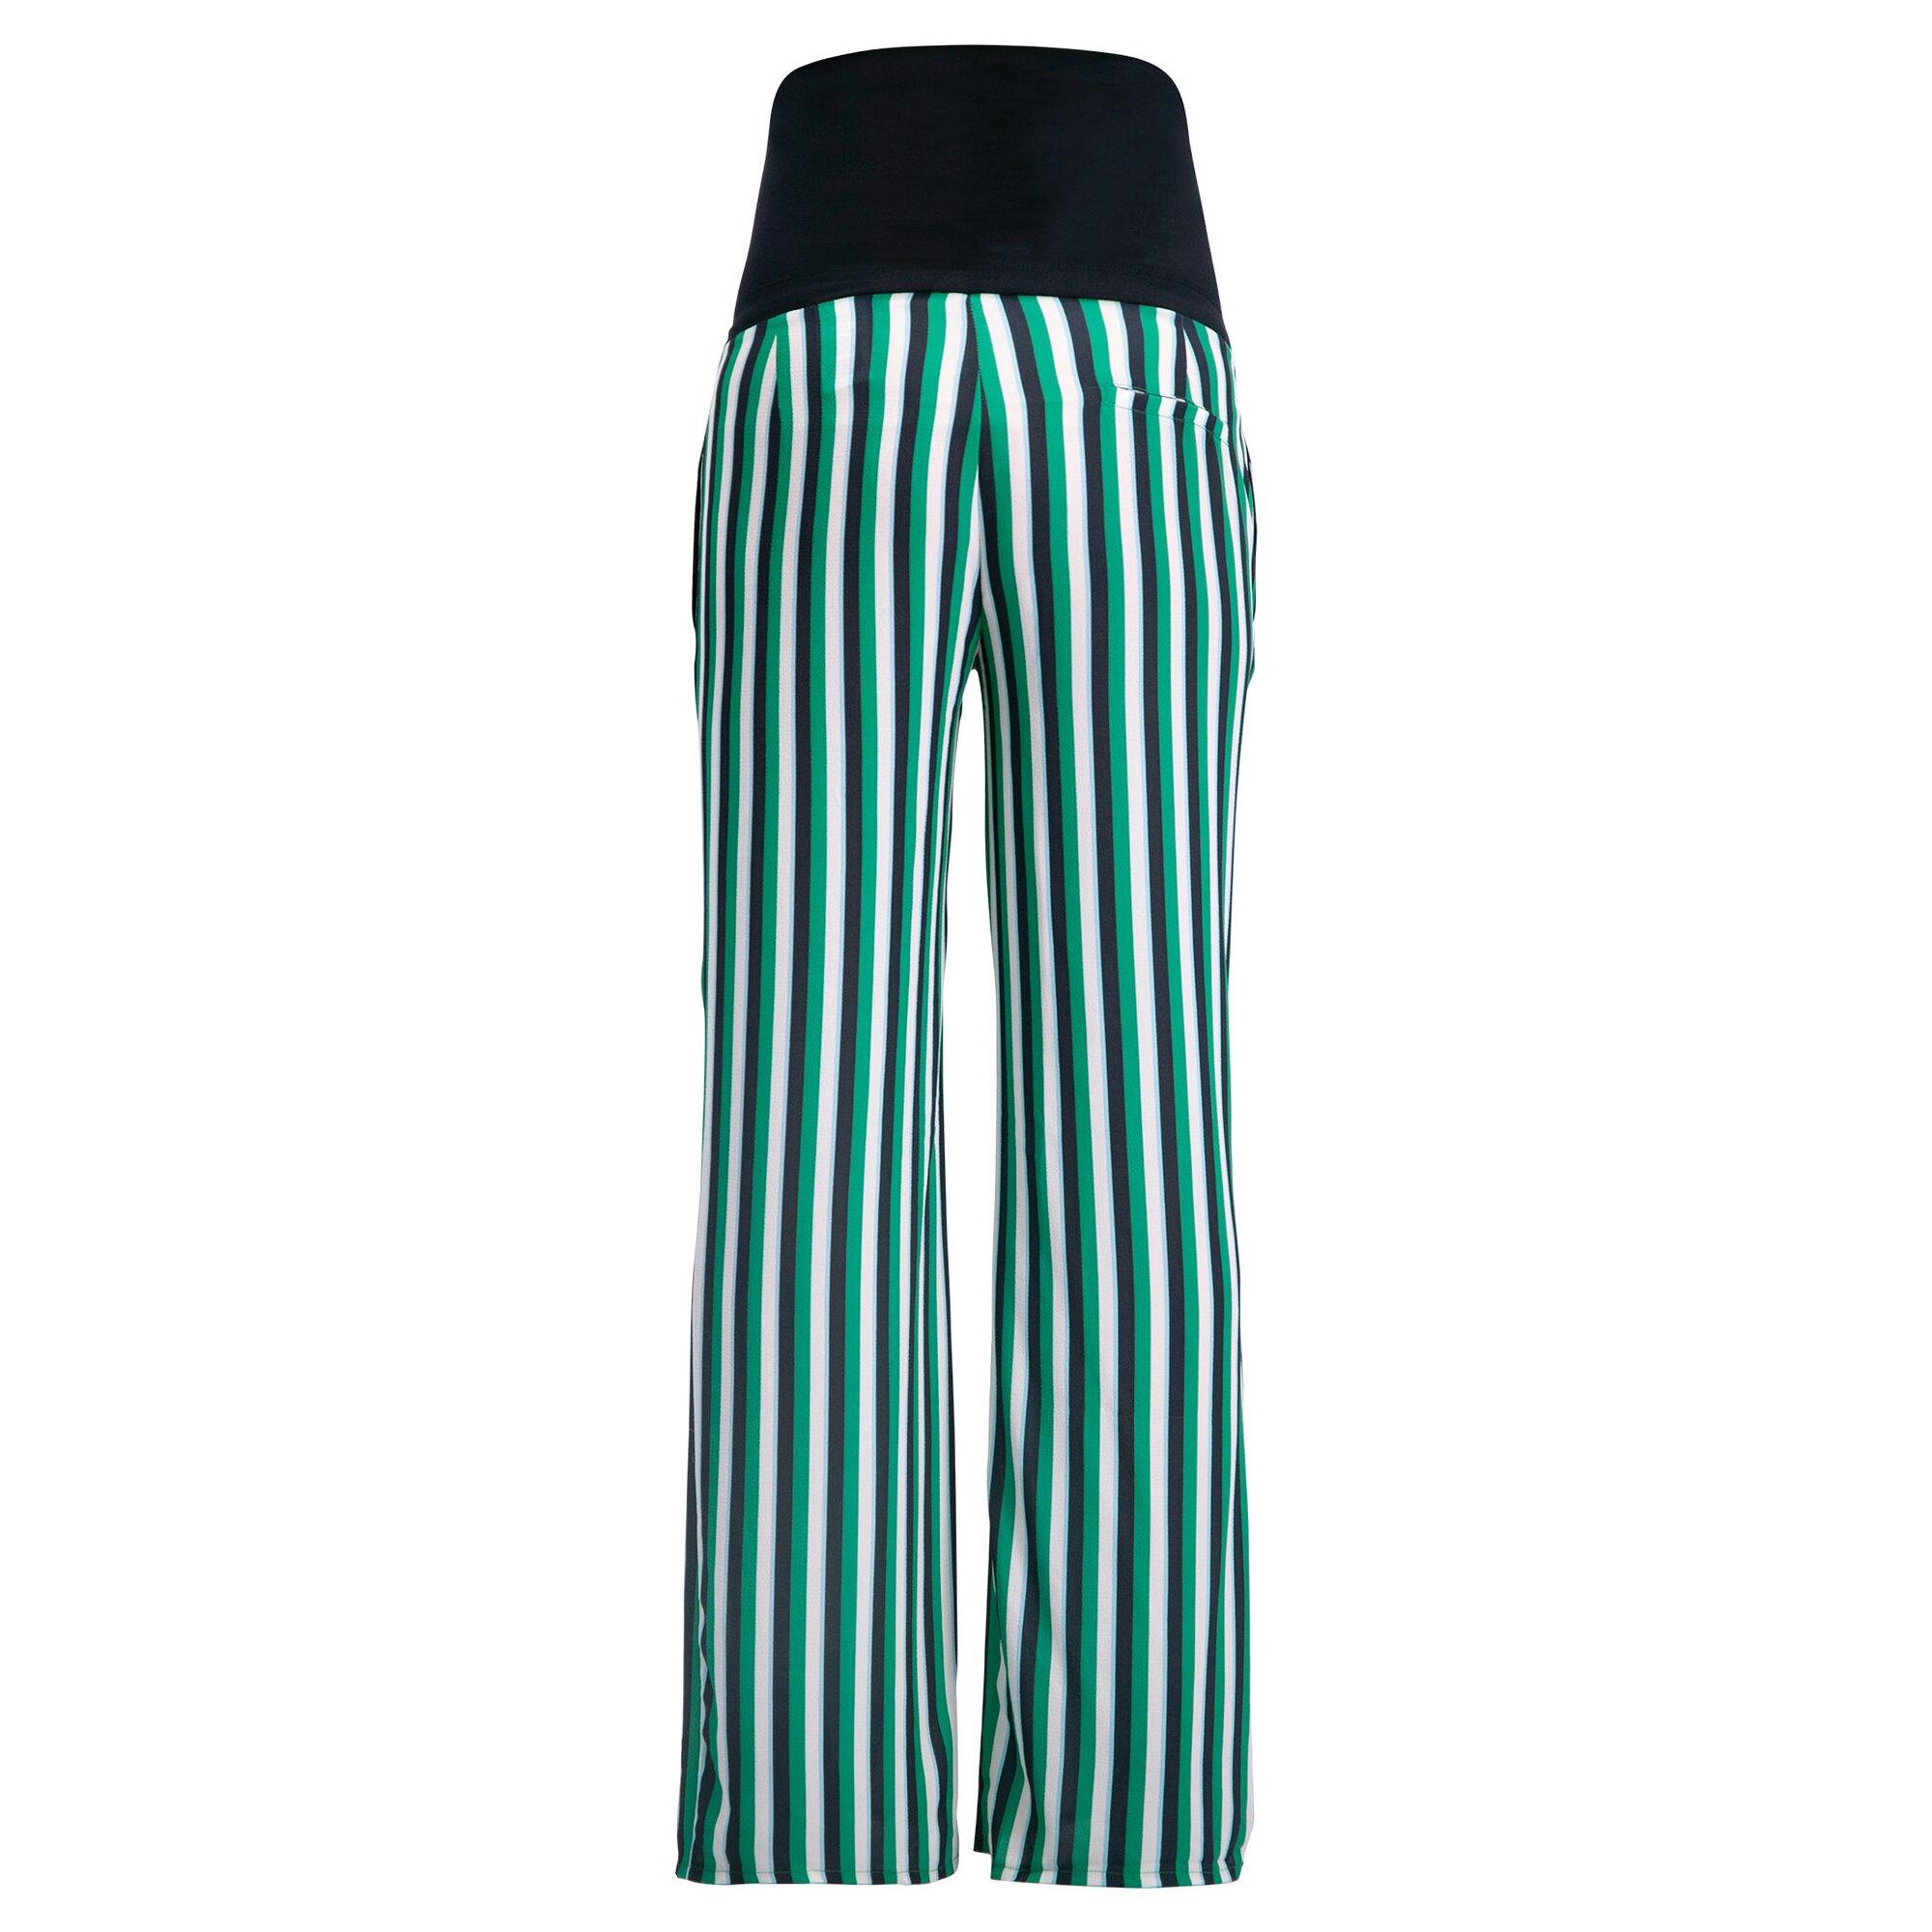 queen-mum-casual-hose-pants